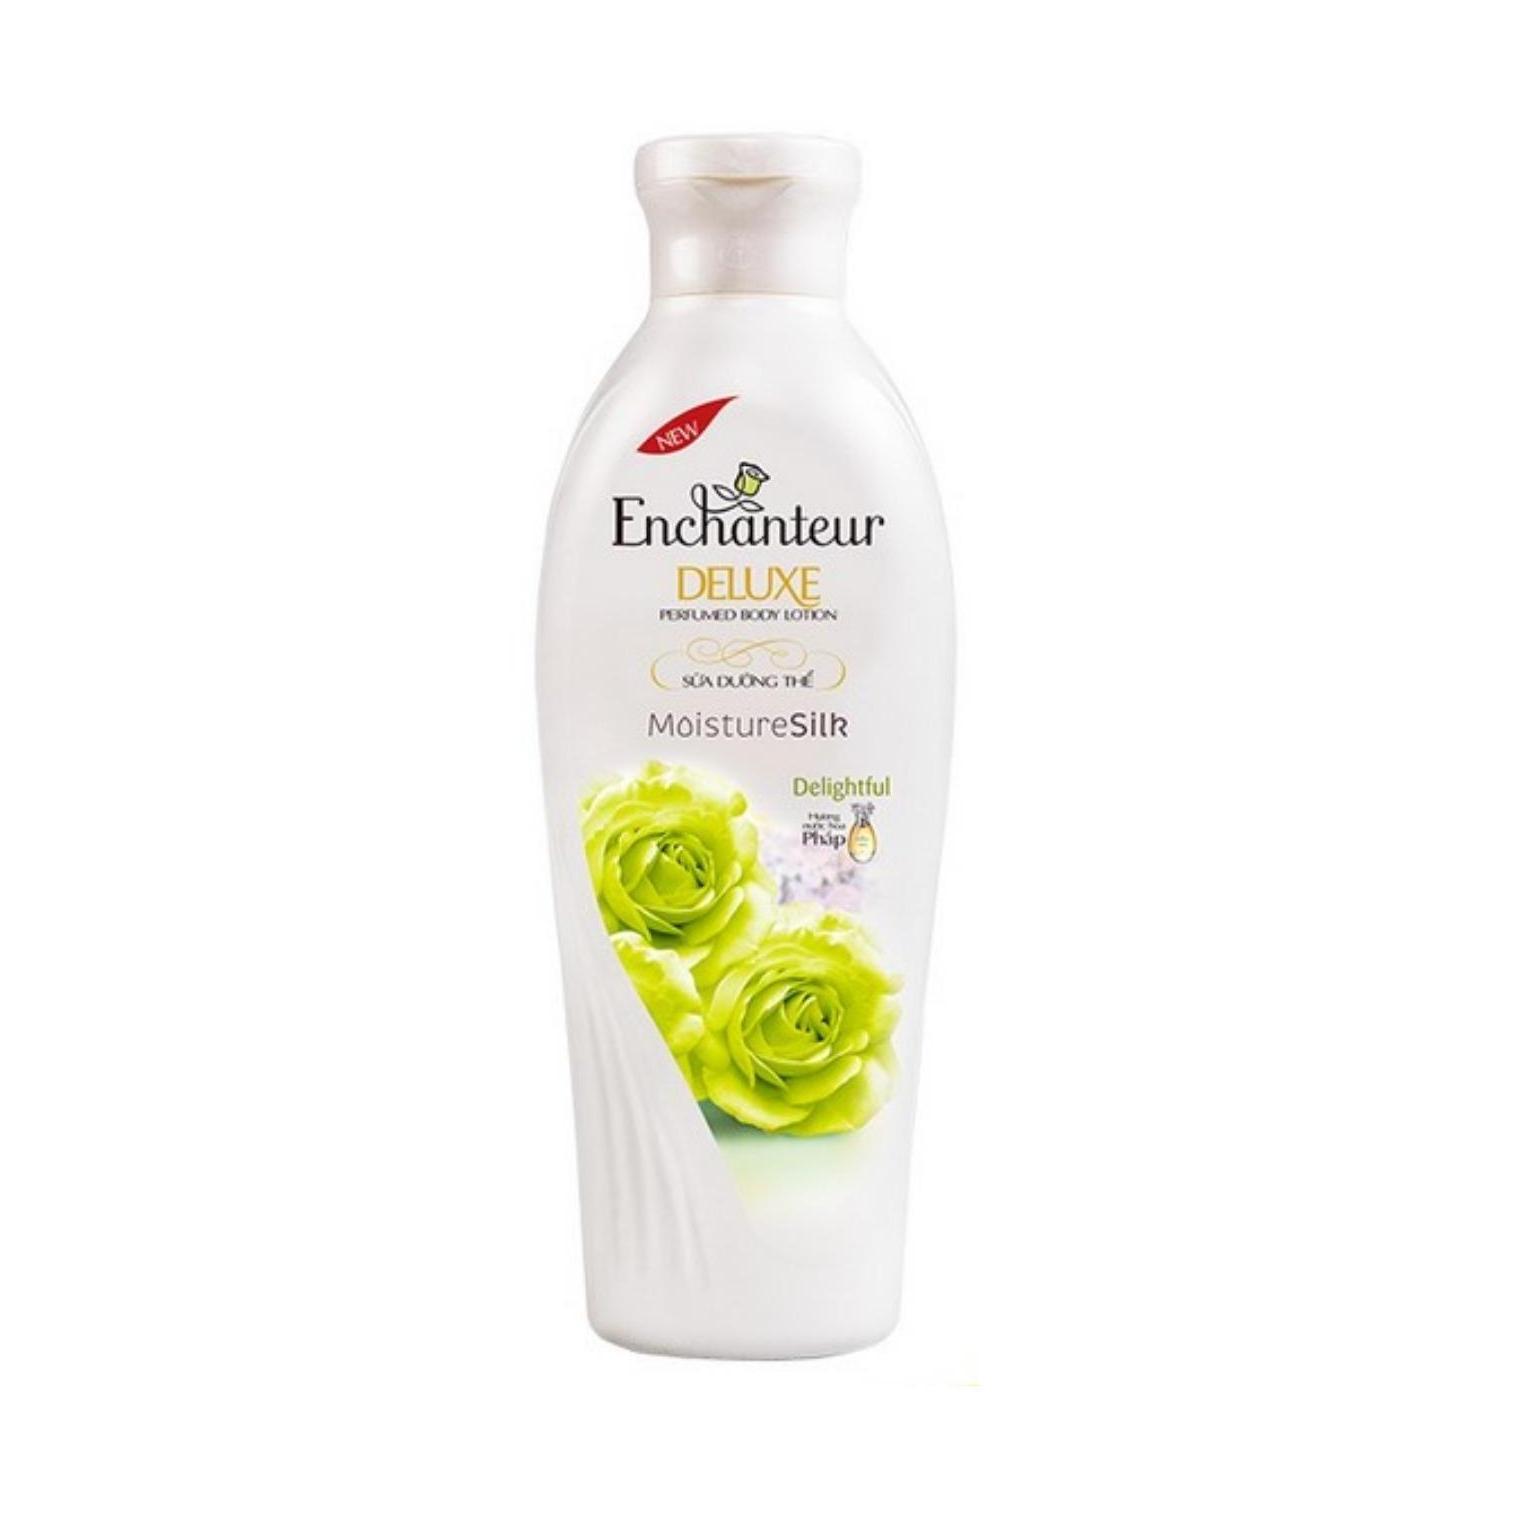 Enchanteur - sữa dưỡng thể Dưỡng ẩm Delightful  200 gr